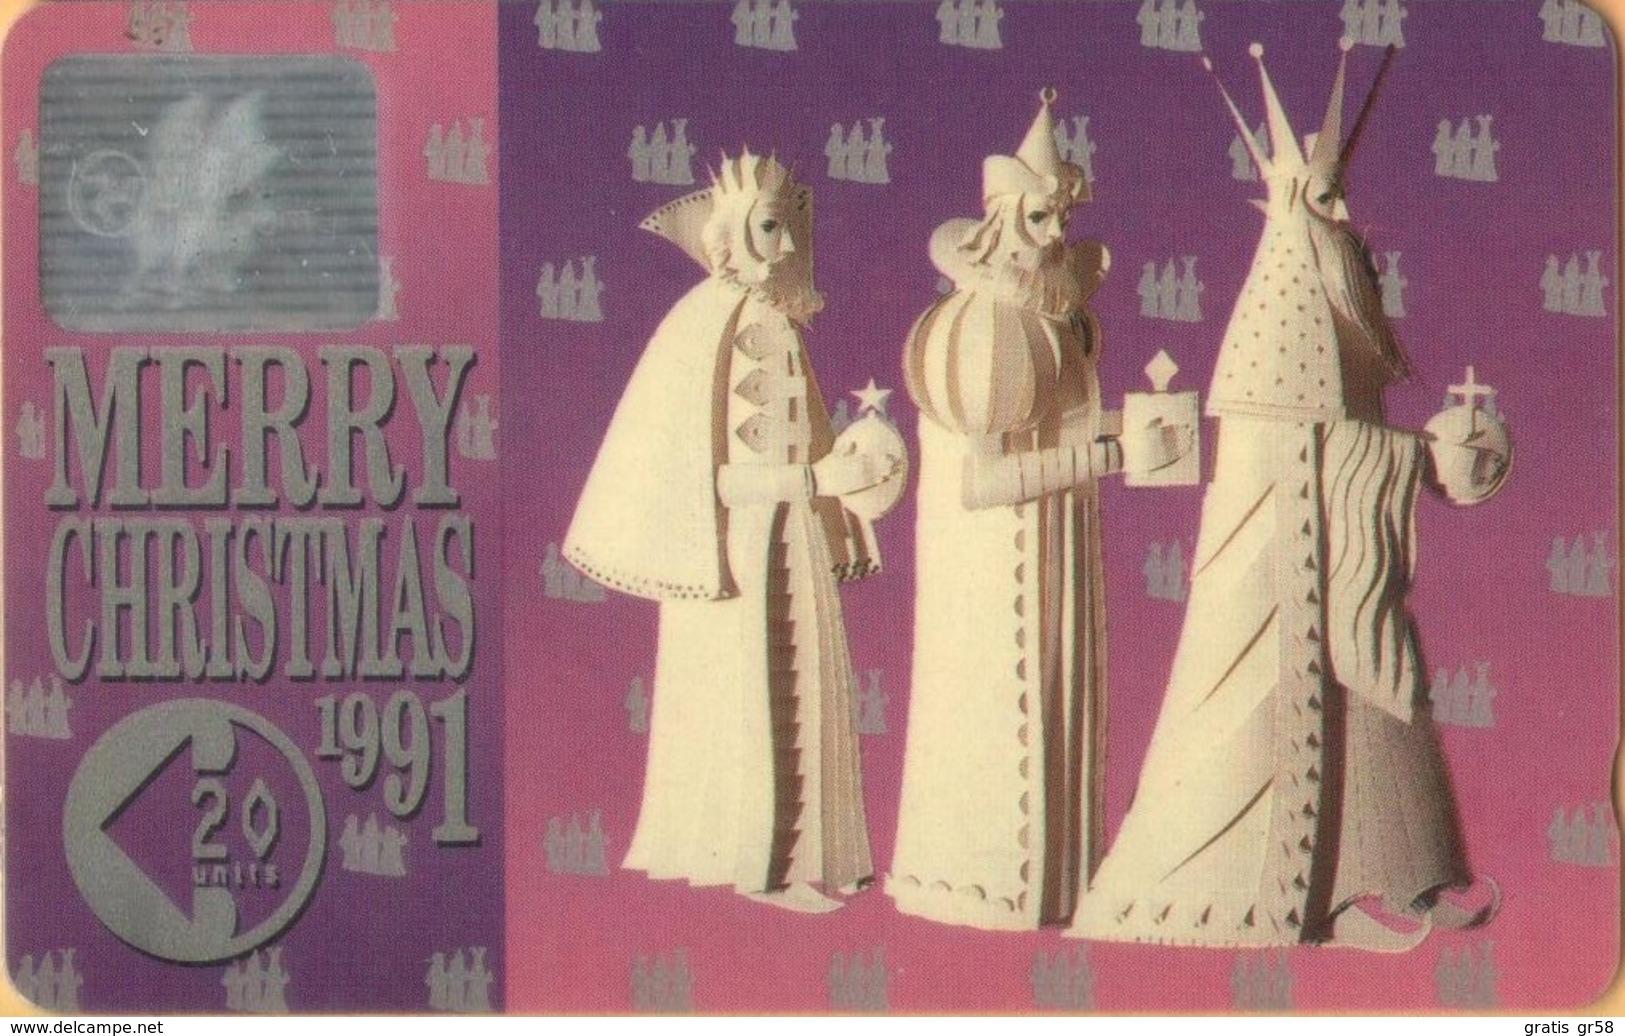 Isle Of Man - GPT, Christmas 1991, CN 11IOMA, Three Wise Men, 3,882ex, 1991, VF Used - Isla De Man